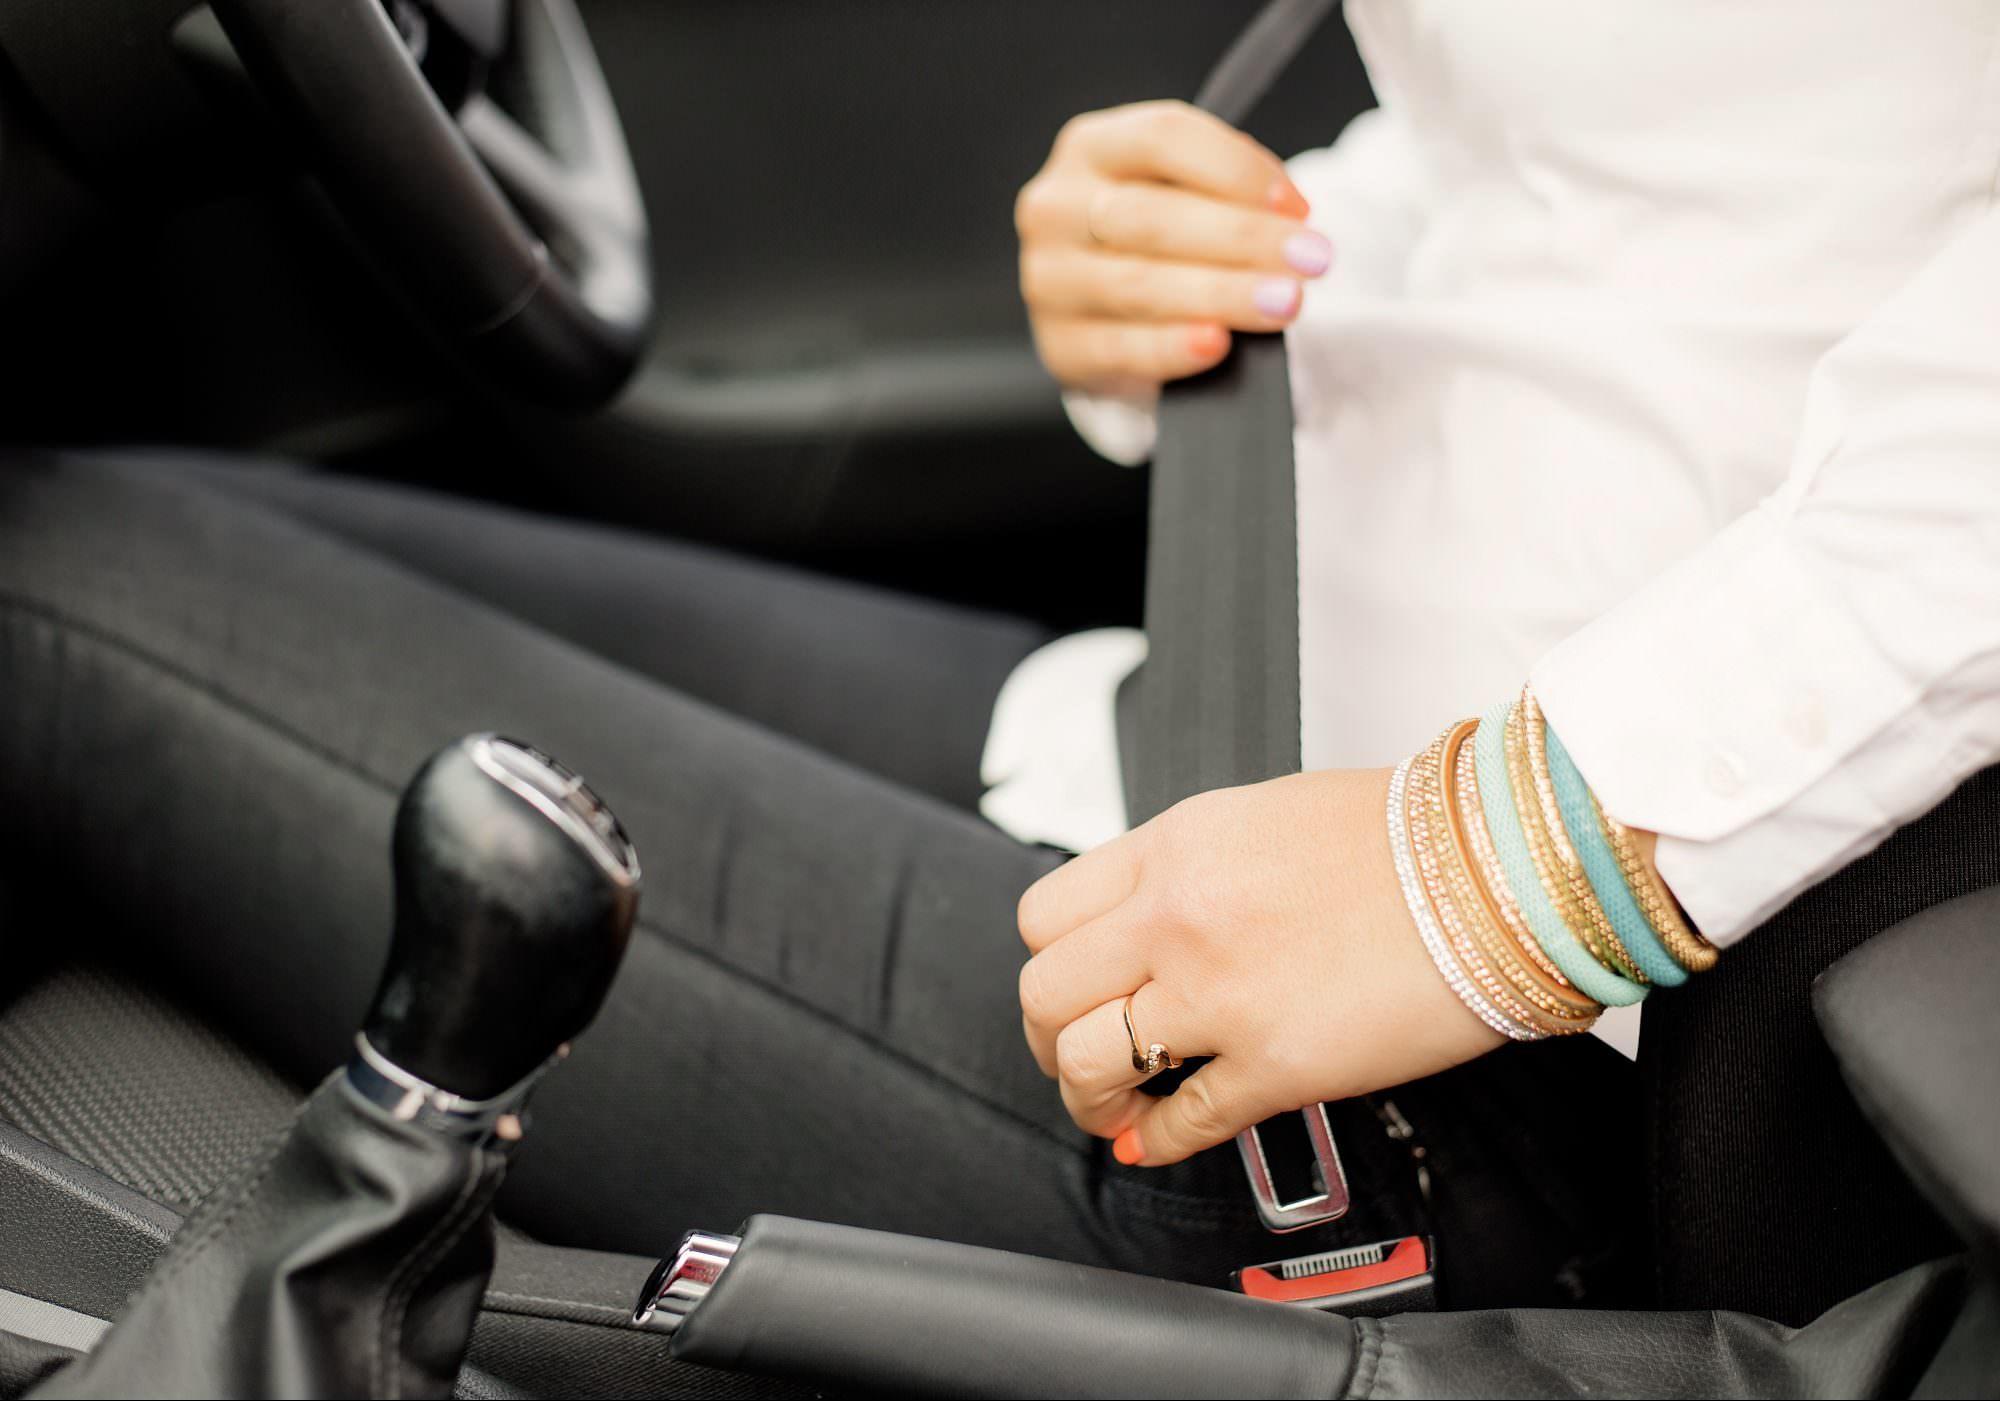 Woman putting on seatbelt